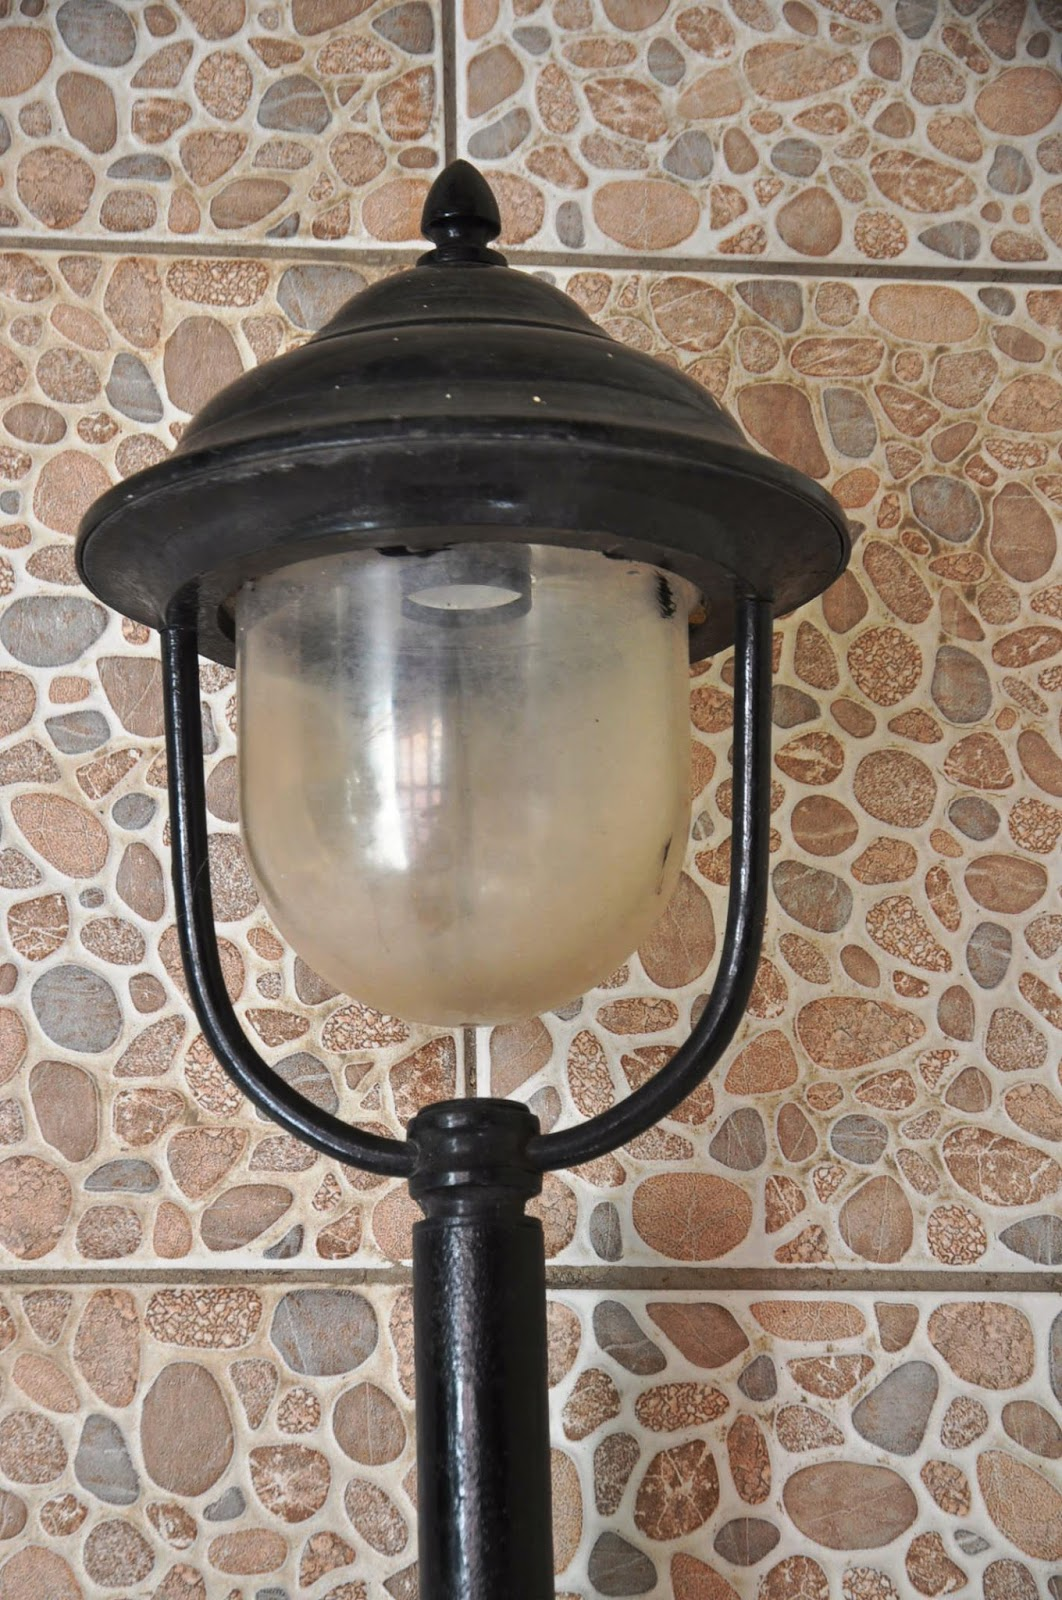 Pondok Barang Antik Barang Antik Lampu Taman Antik Lawas Vintage Era 1980 An